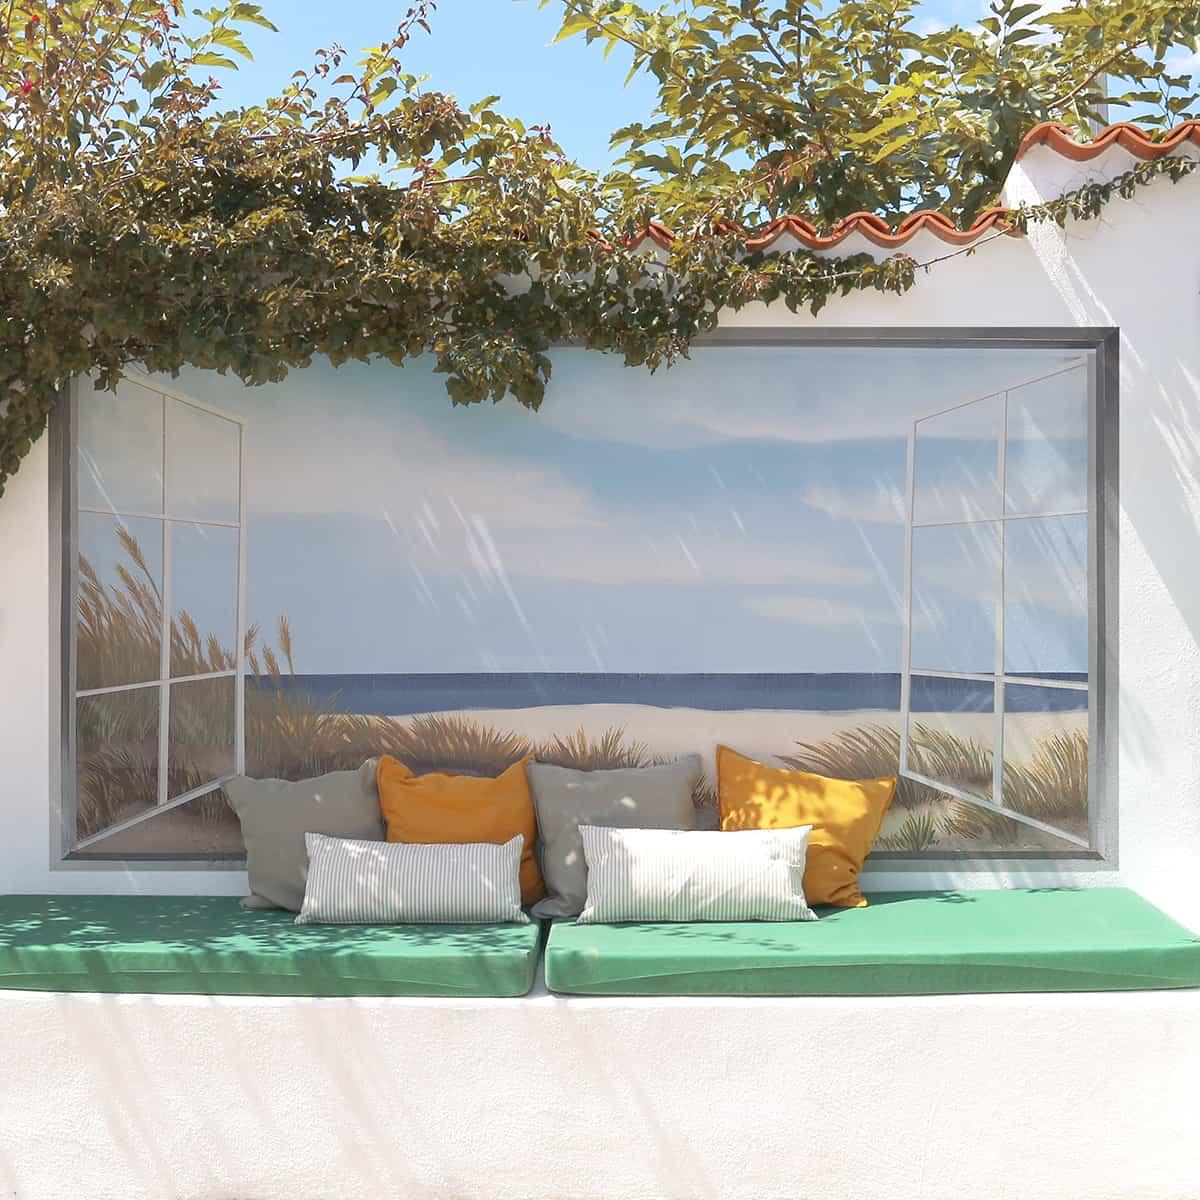 adorna las paredes de tus zonas exteriores con un mural pintado a mano 1